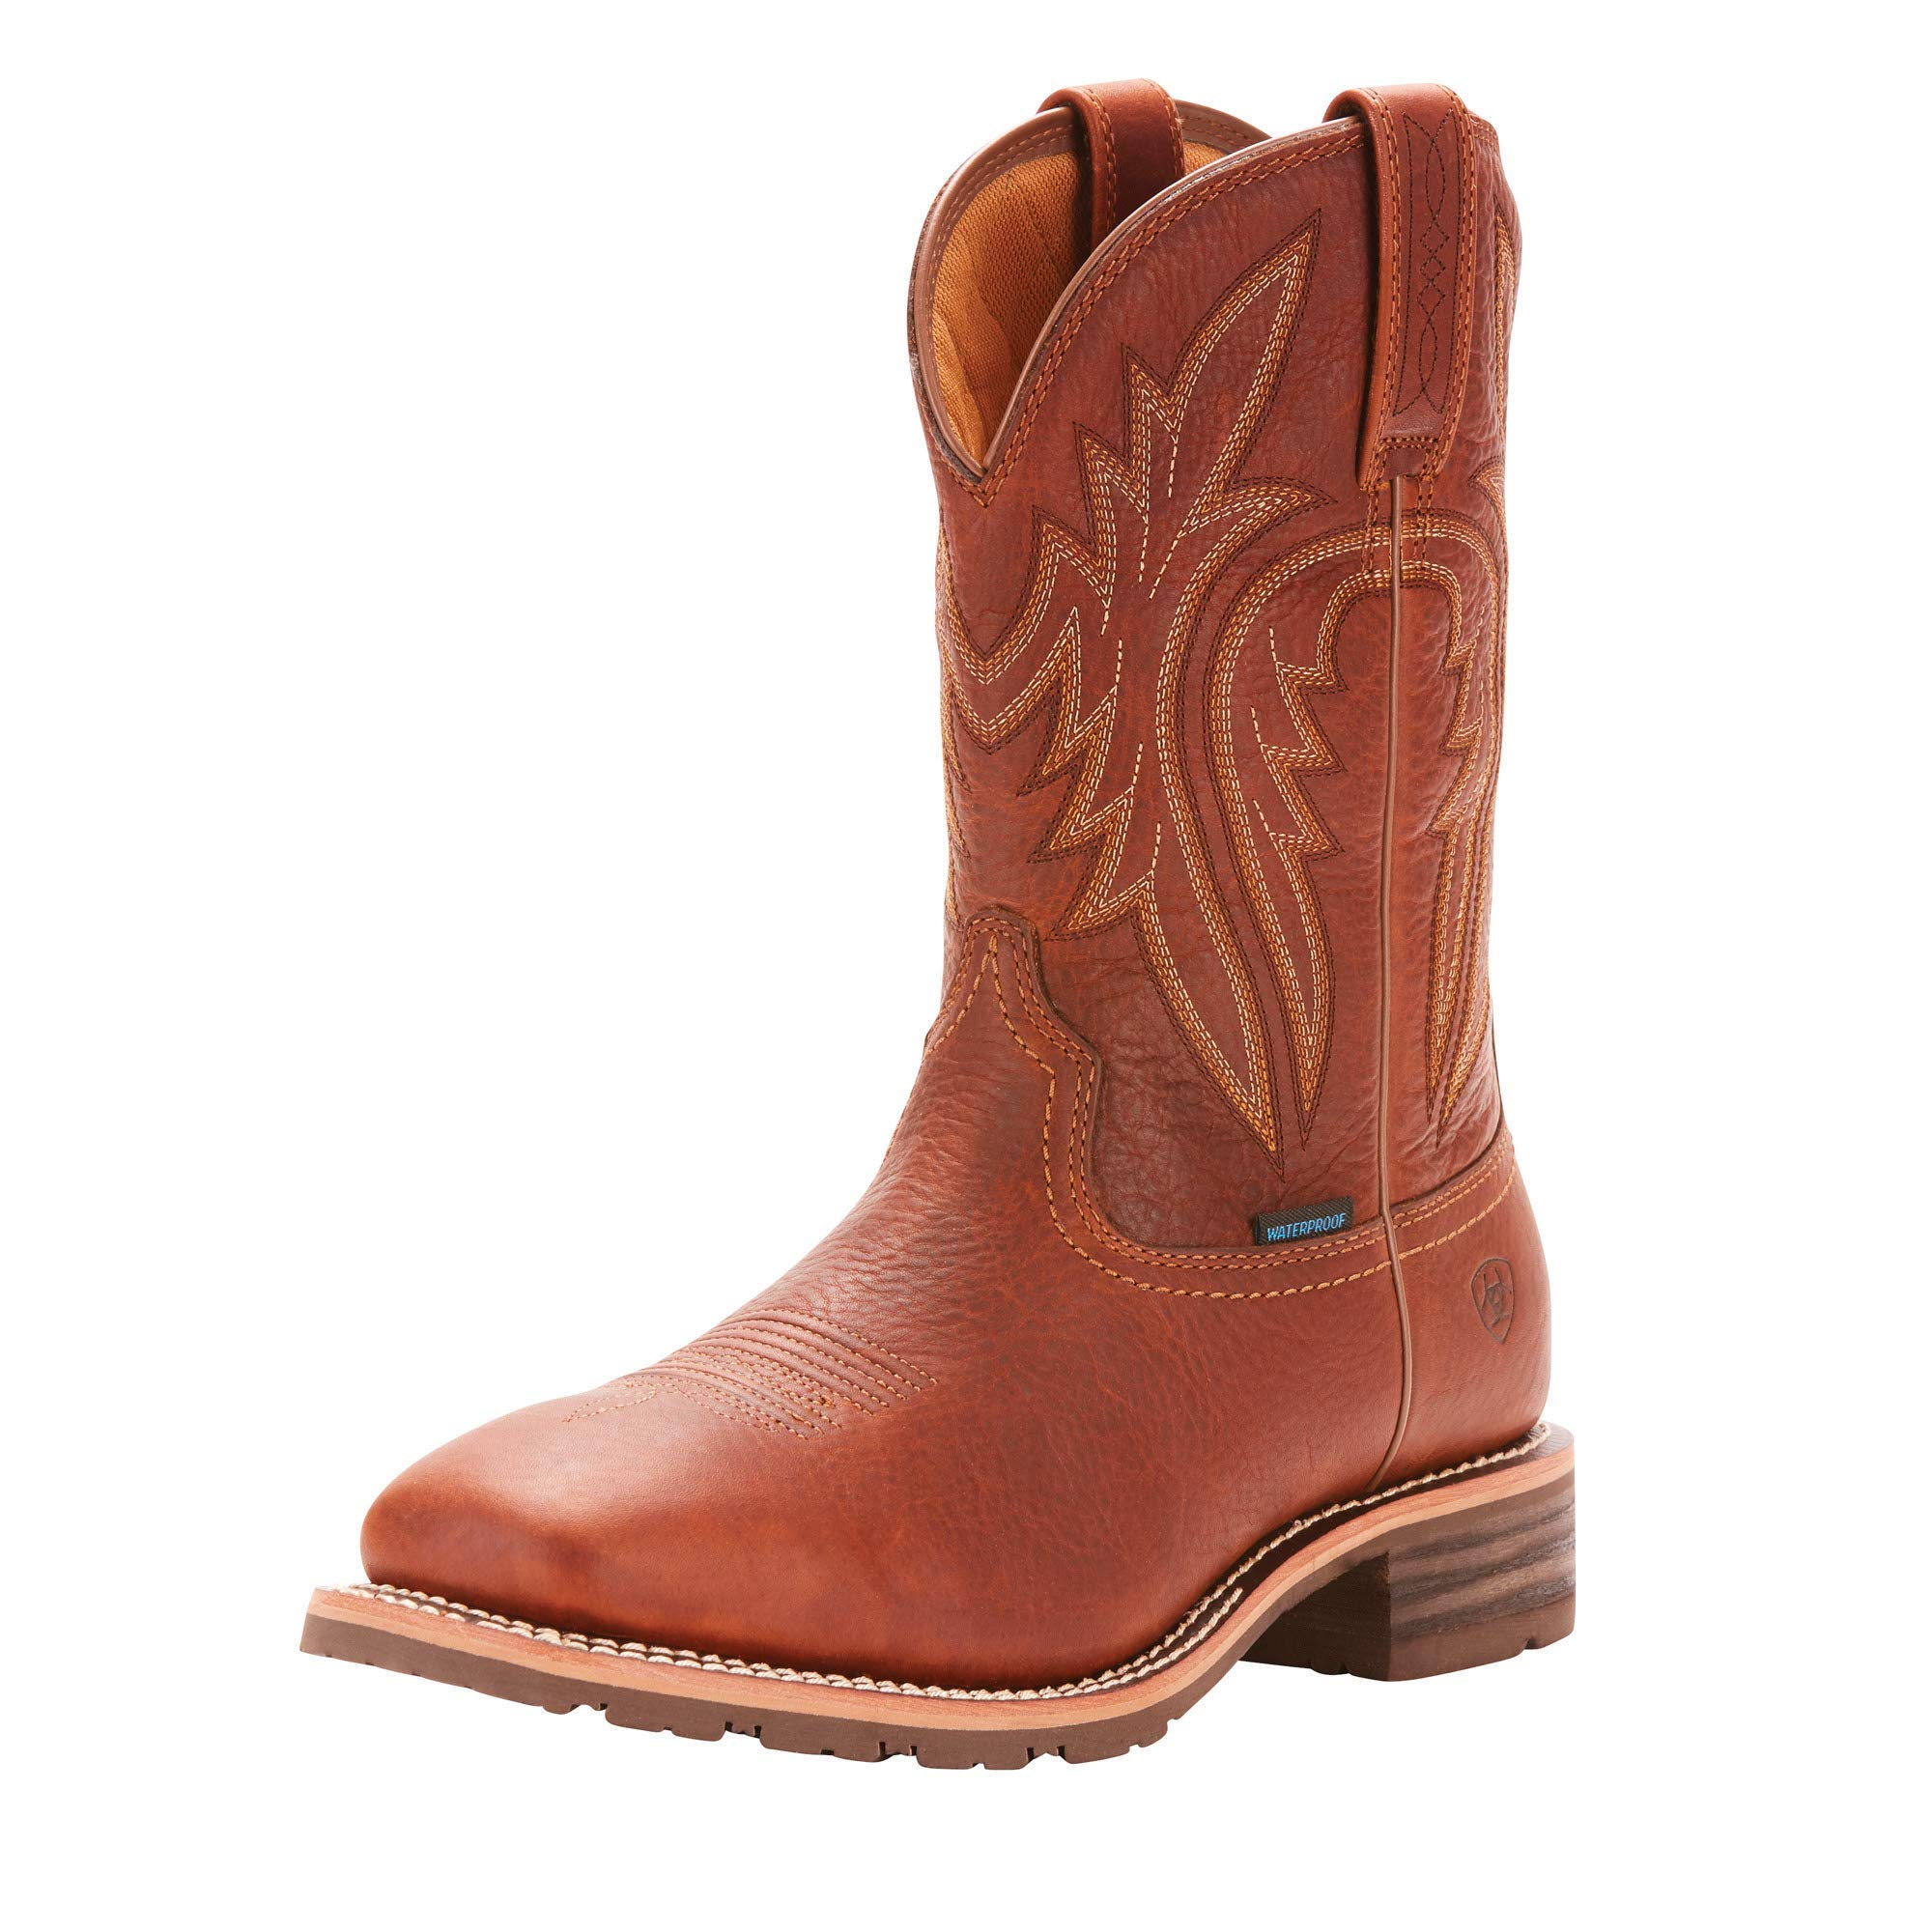 Ariat Men's Hybrid Rancher H2O 400G Western Boot, Sunshine, 9 2E US by ARIAT